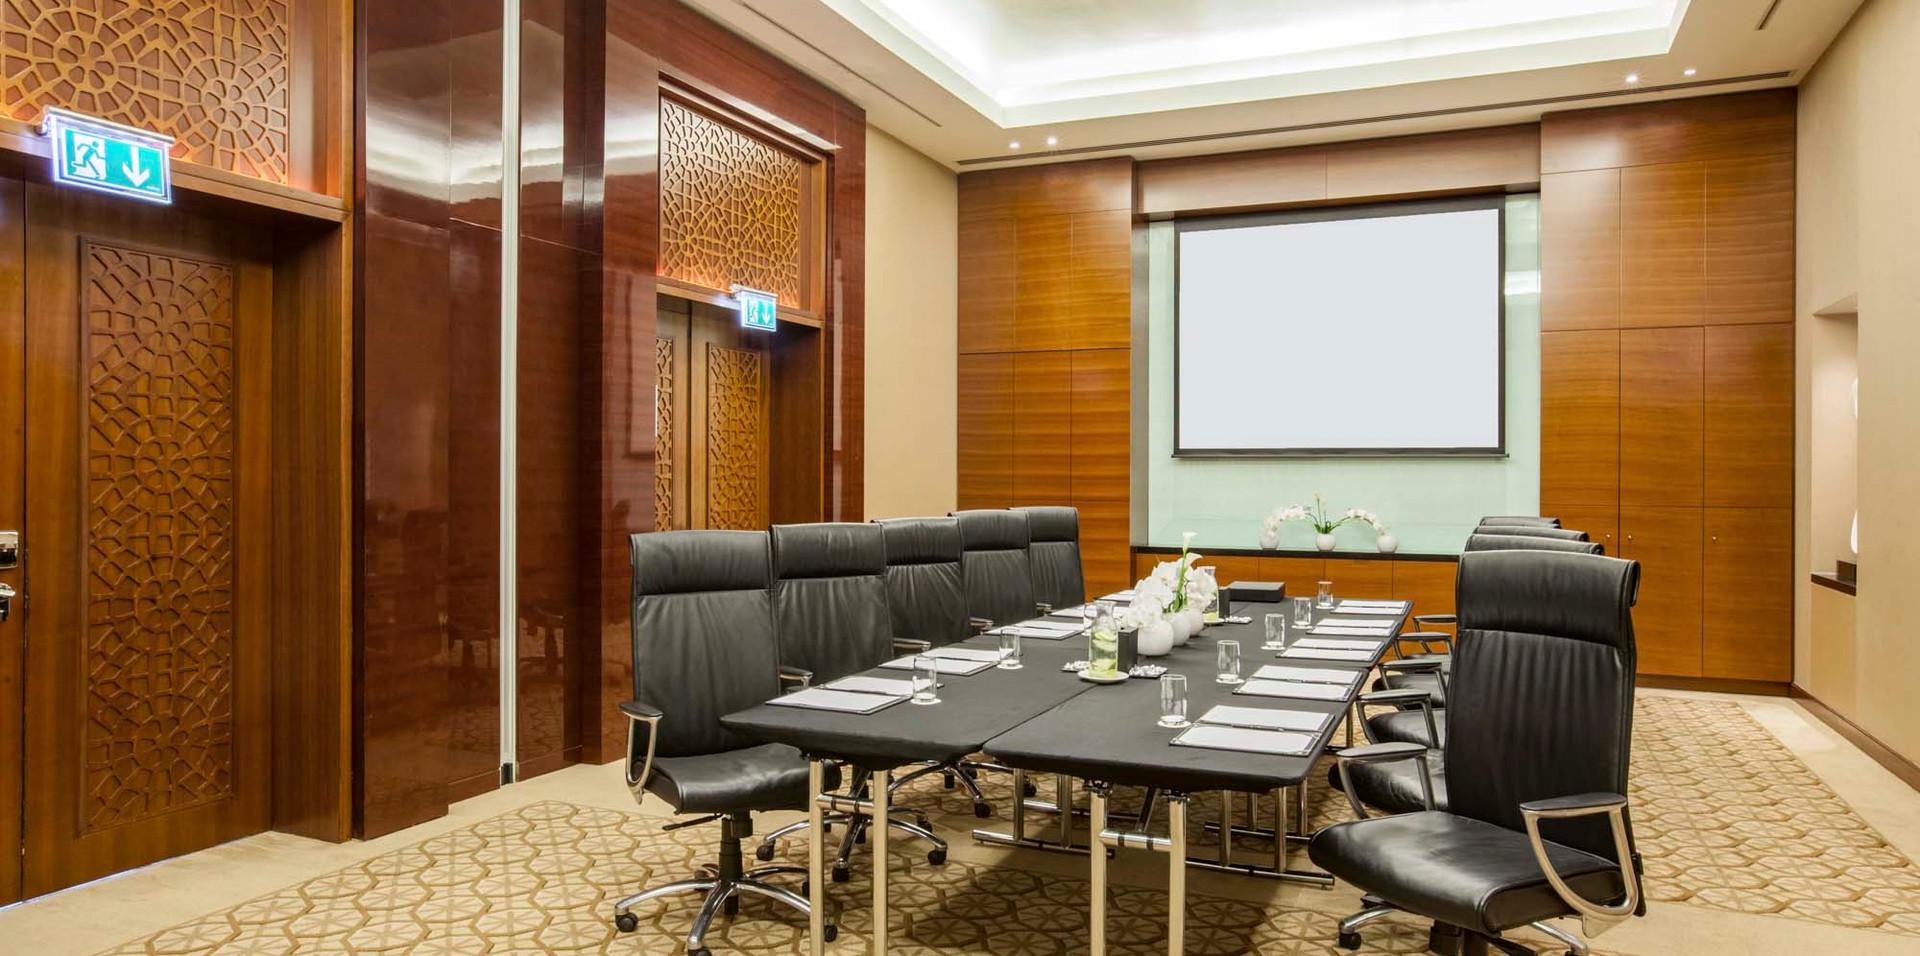 Al Waha  | The Event Centre